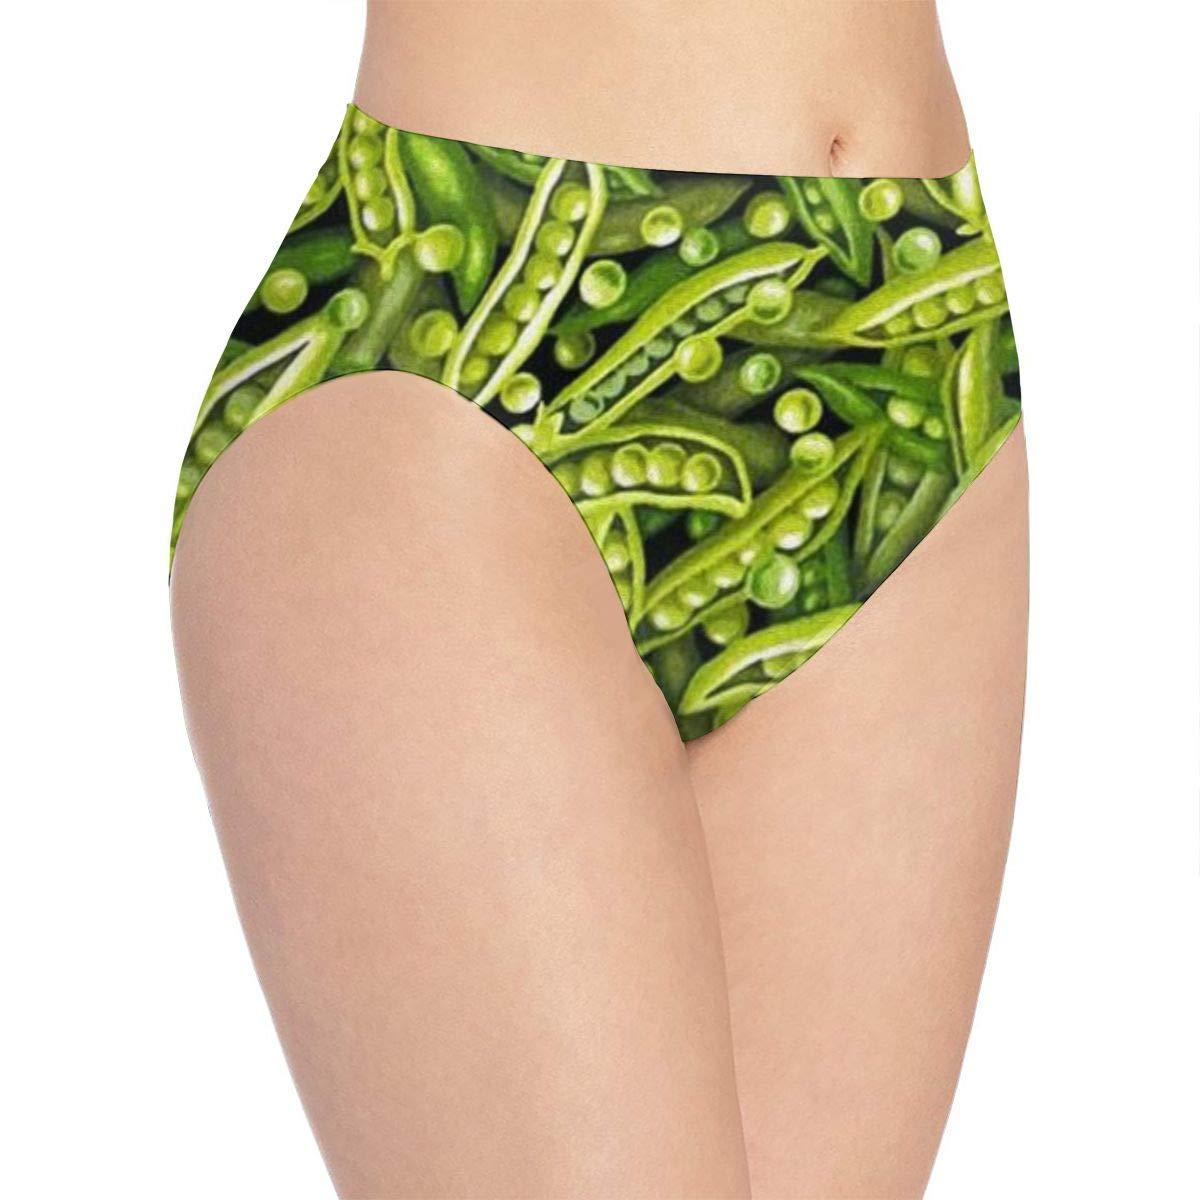 SweetieP Womens A Lot of Peas Bikini Briefs Comfy Full Coverage Underwear